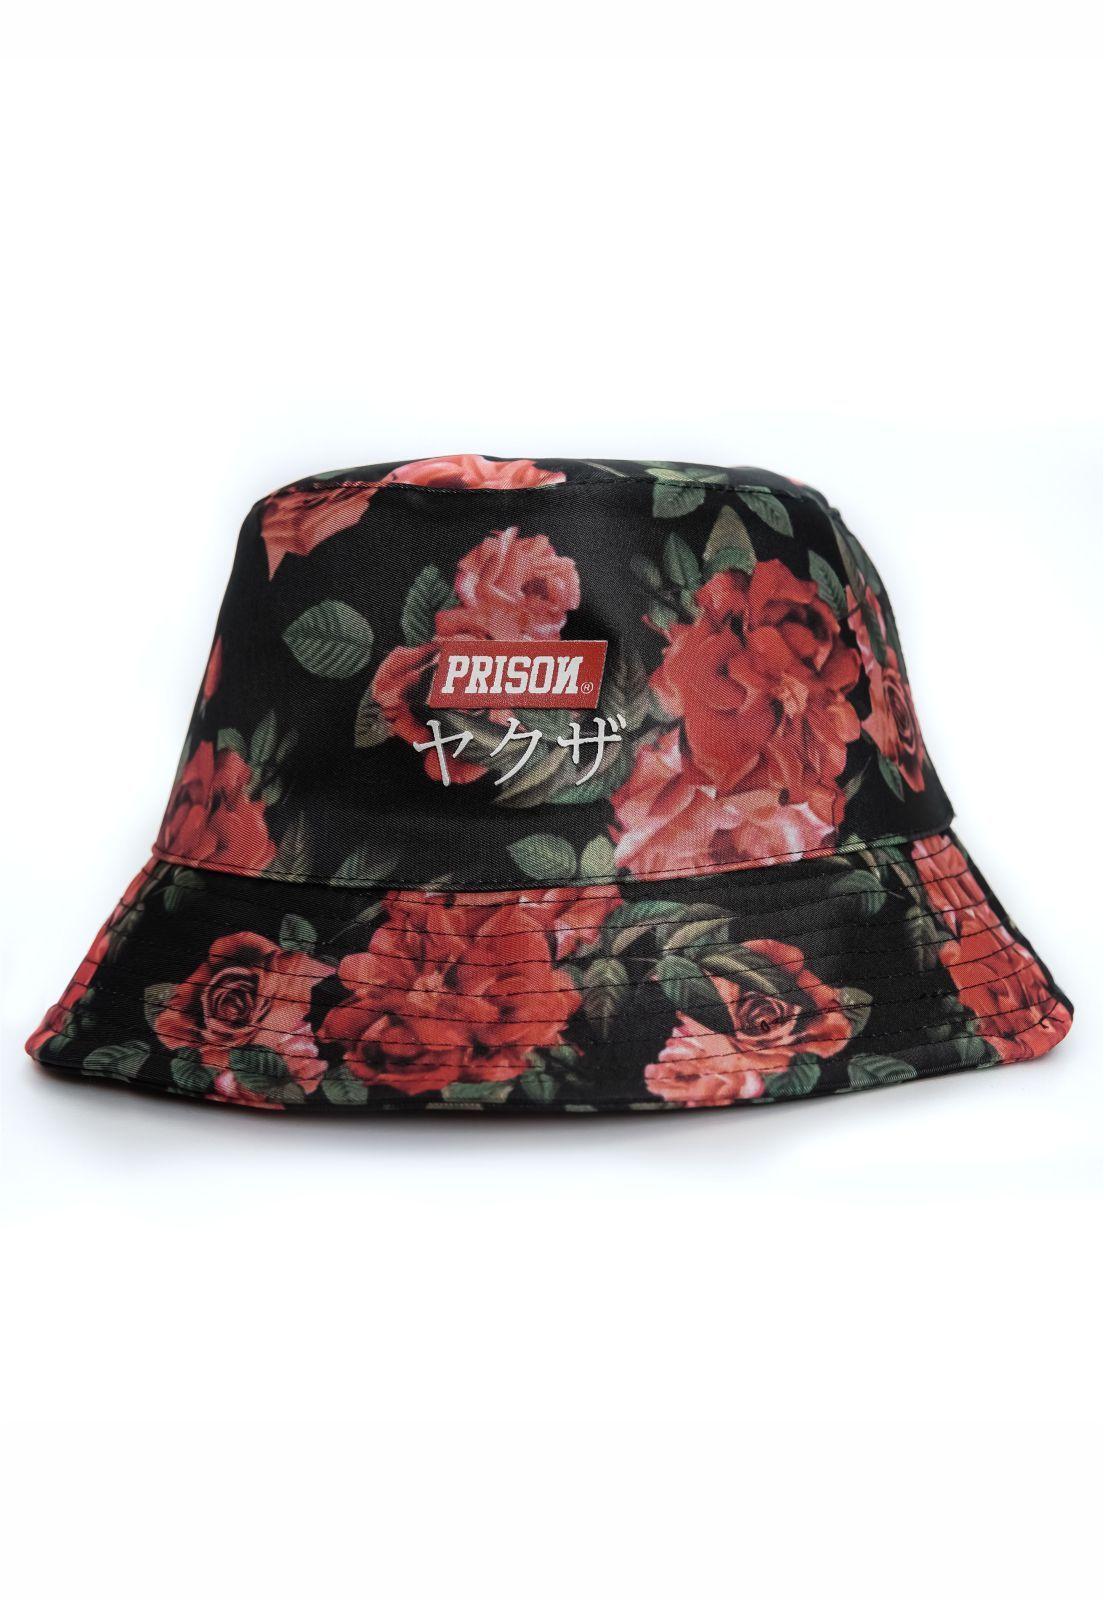 Bucket Hat Prison Floral Japan